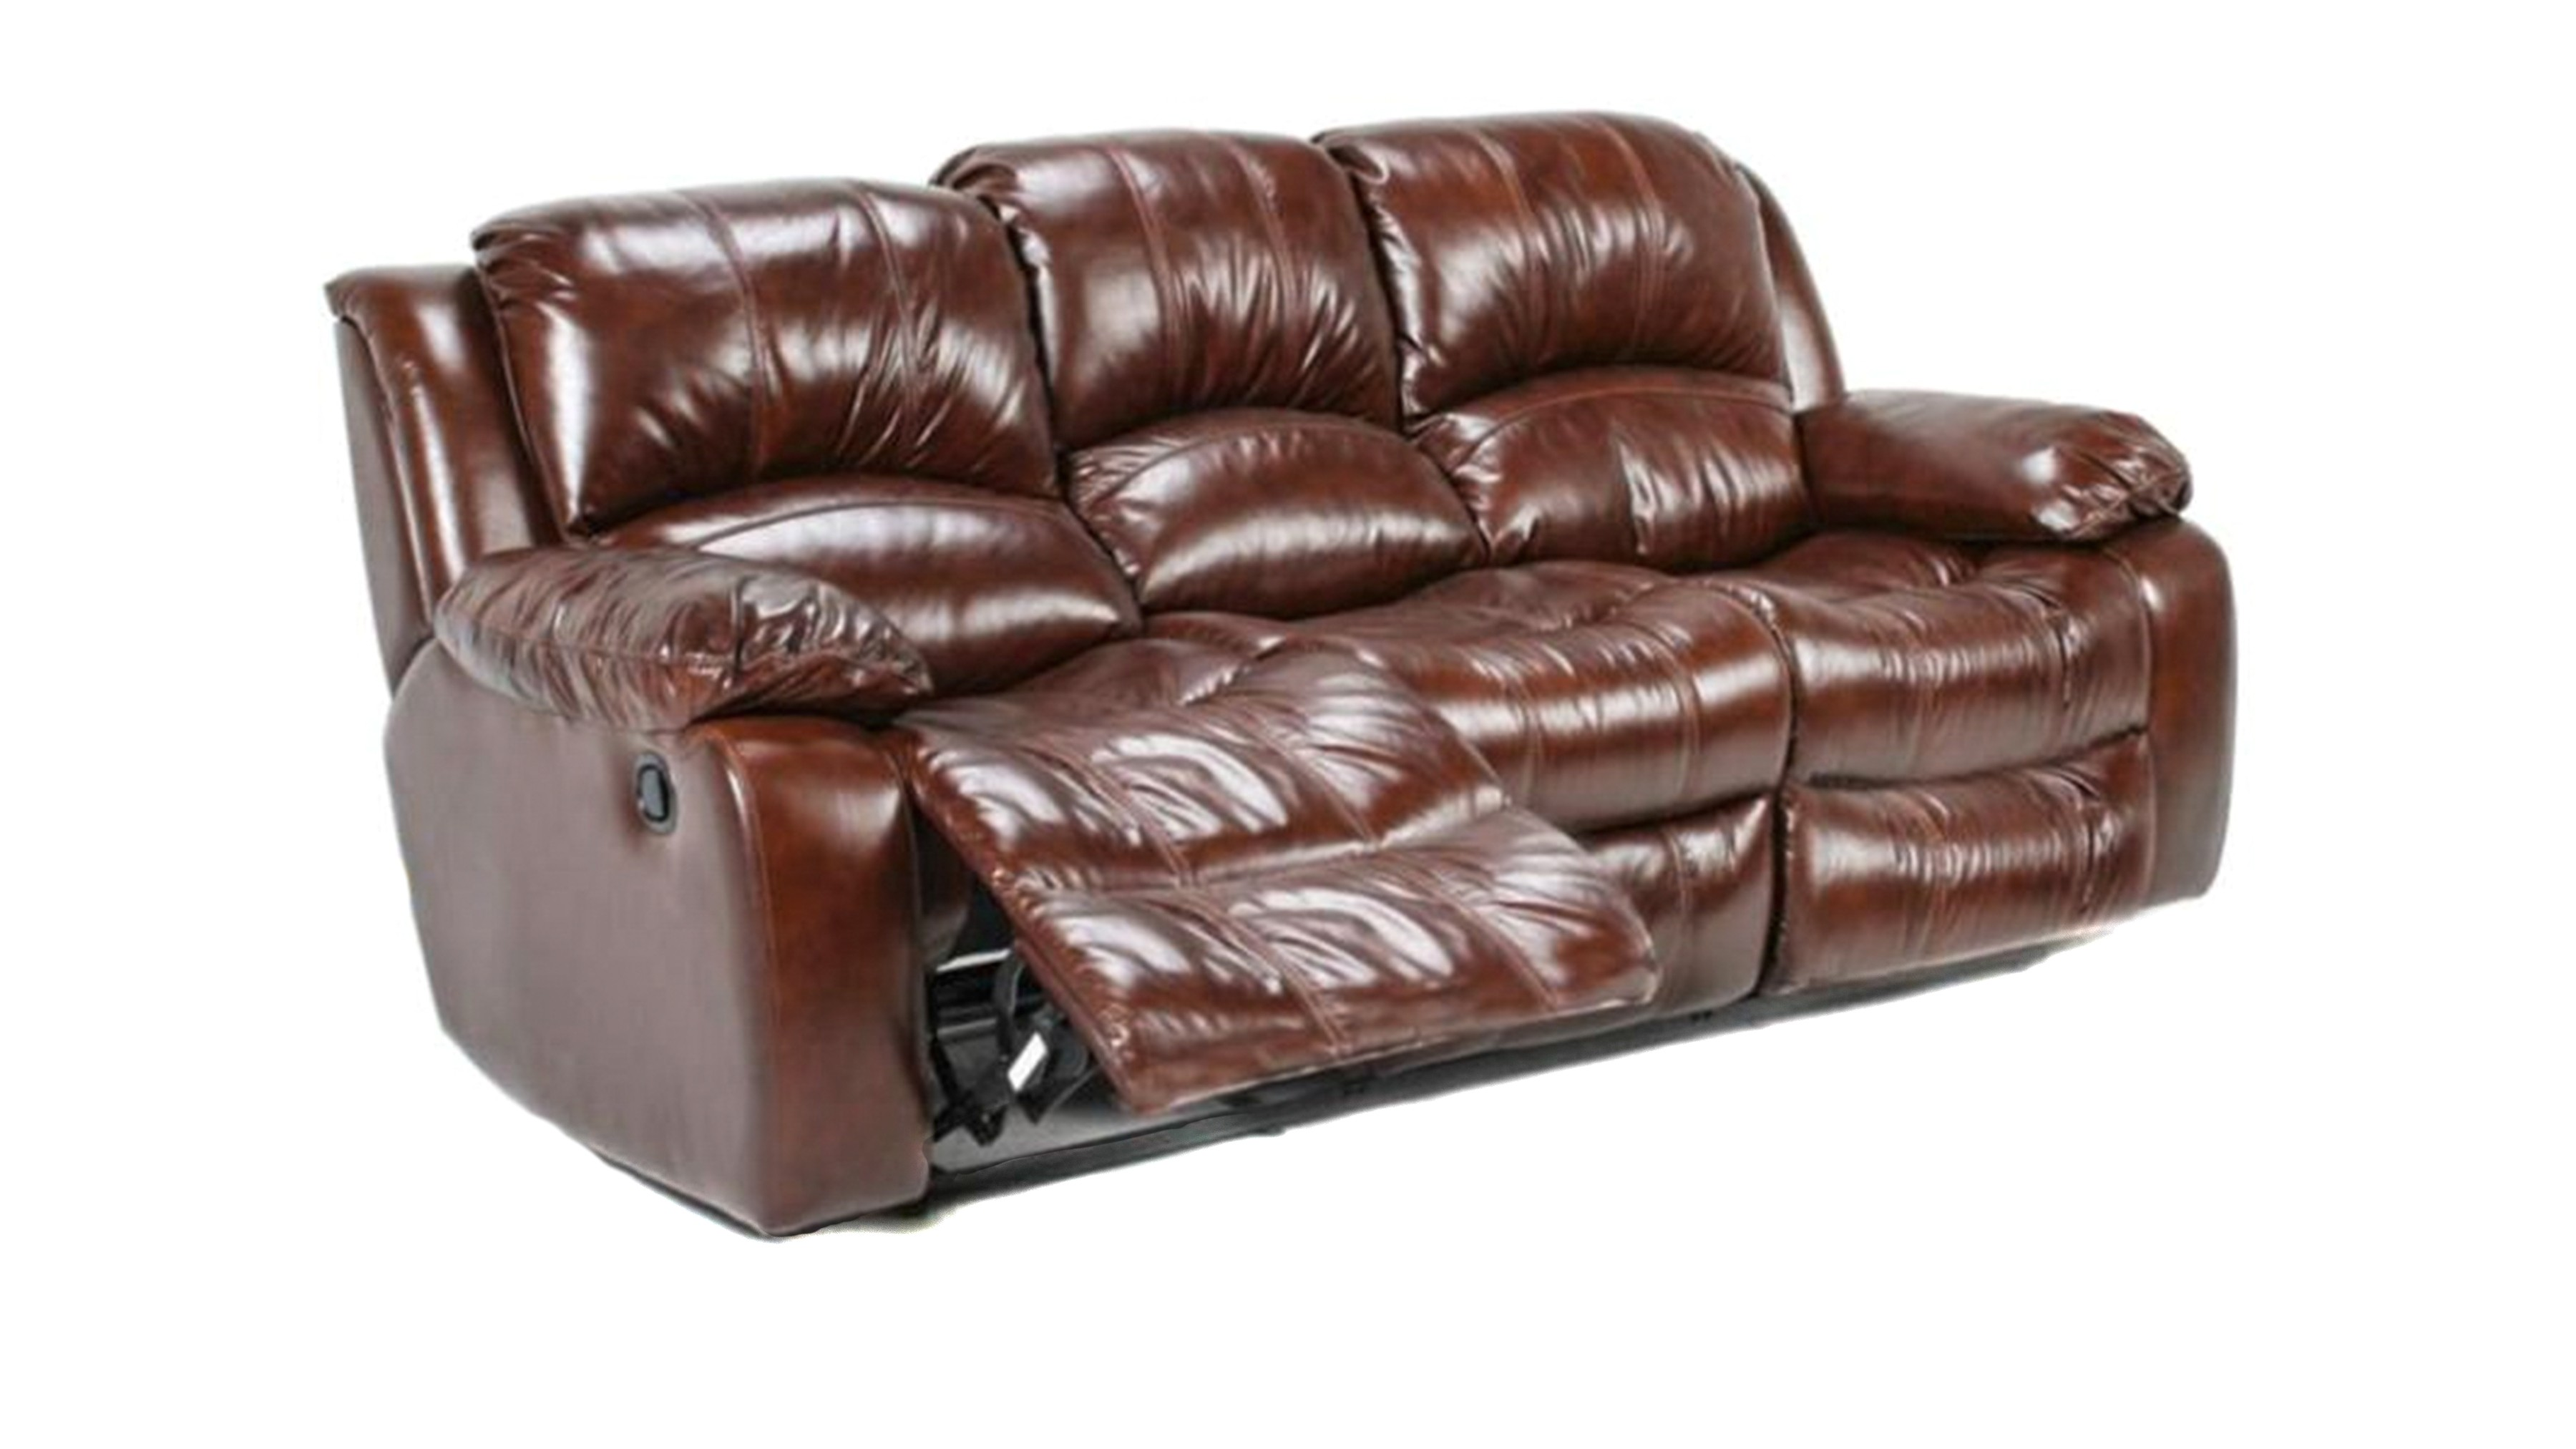 Yoga Chair Stretch sofa Singular Dual Reclining sofa Picture Ideas Kanes Furniture sofas and